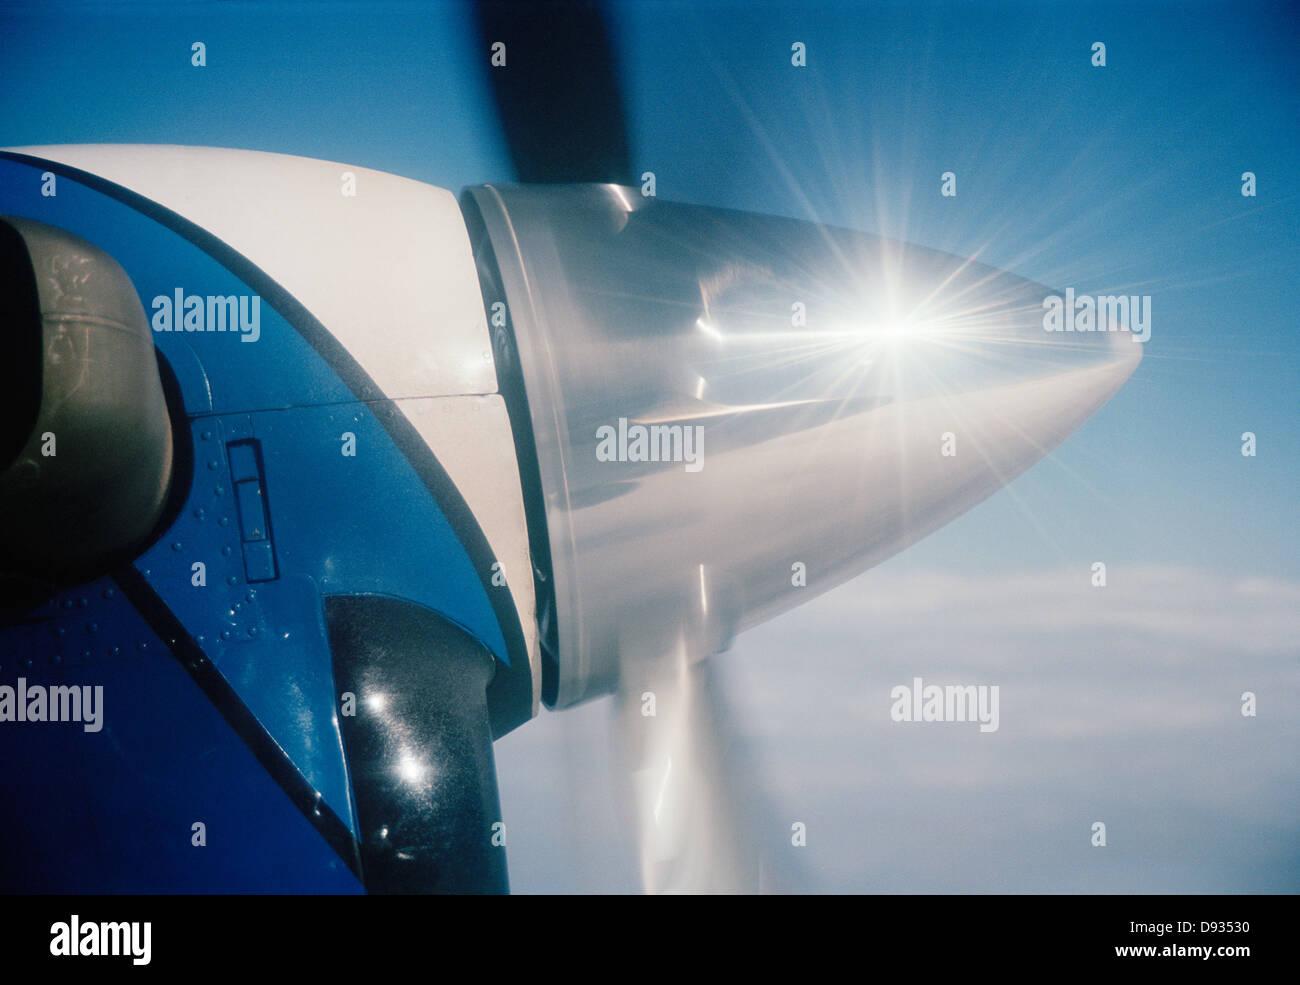 Shining airscrew, Sweden. - Stock Image